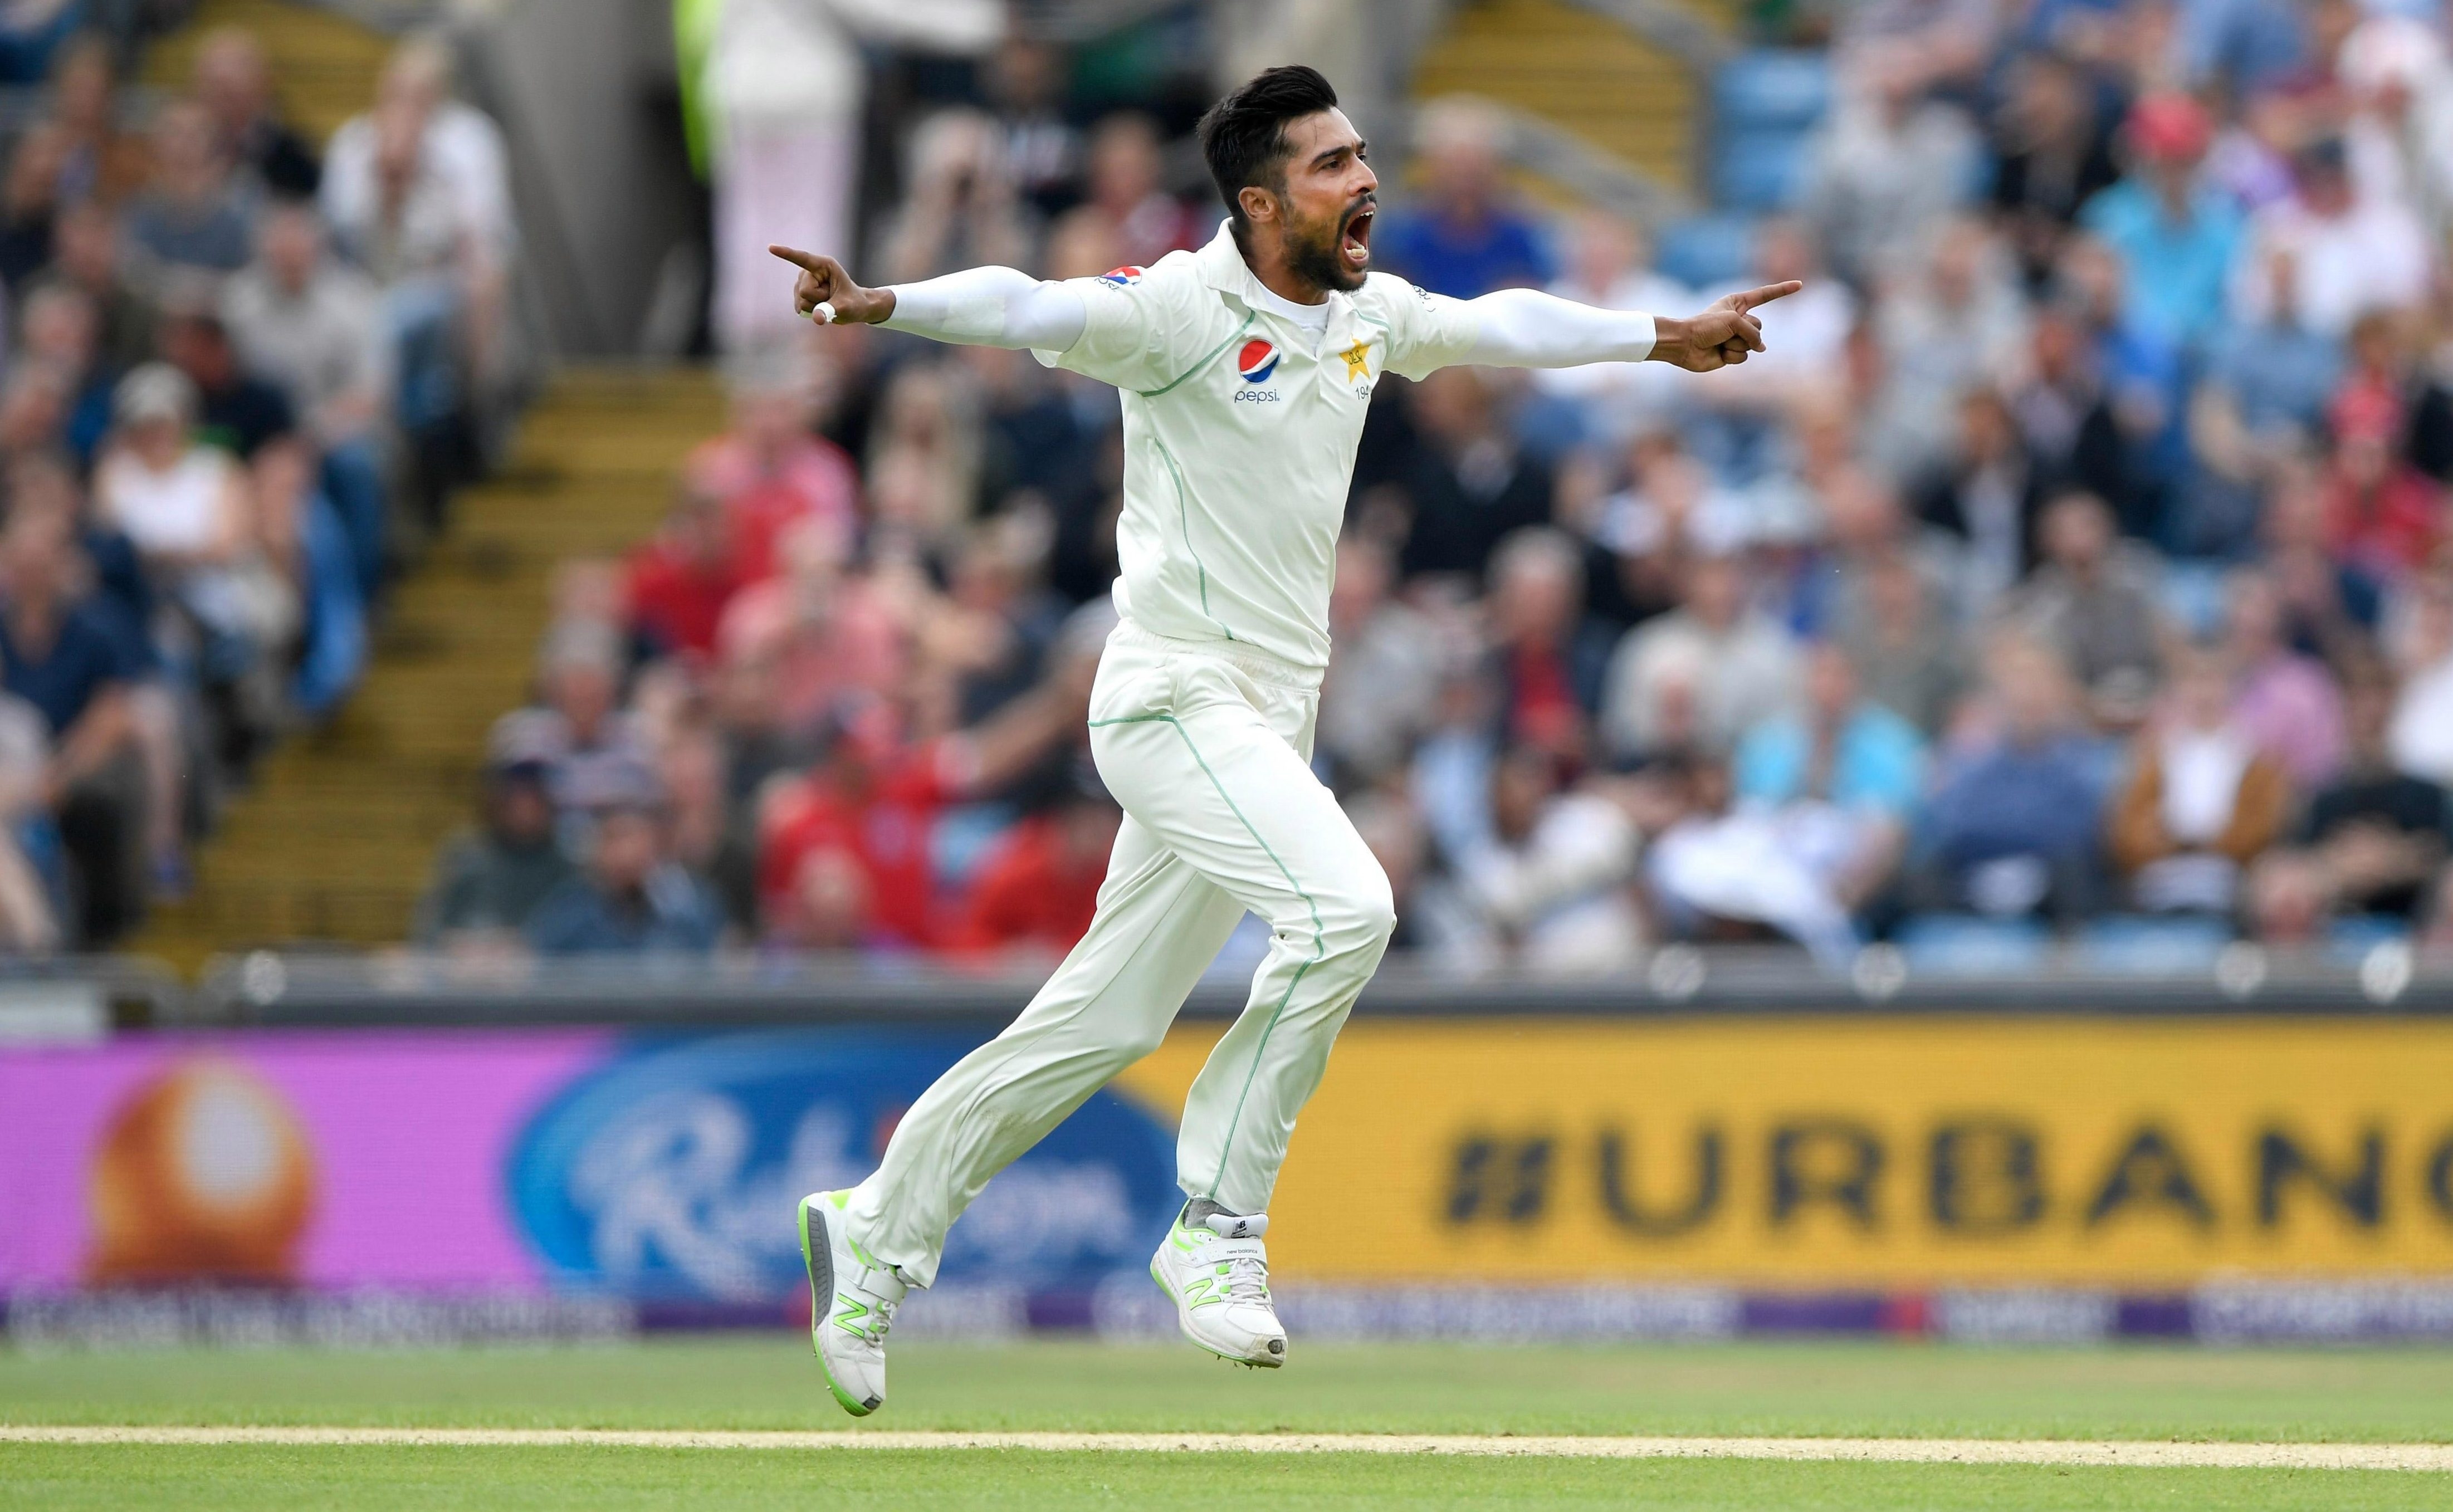 Mohammad Amir celebrates the wicket of Joe Root